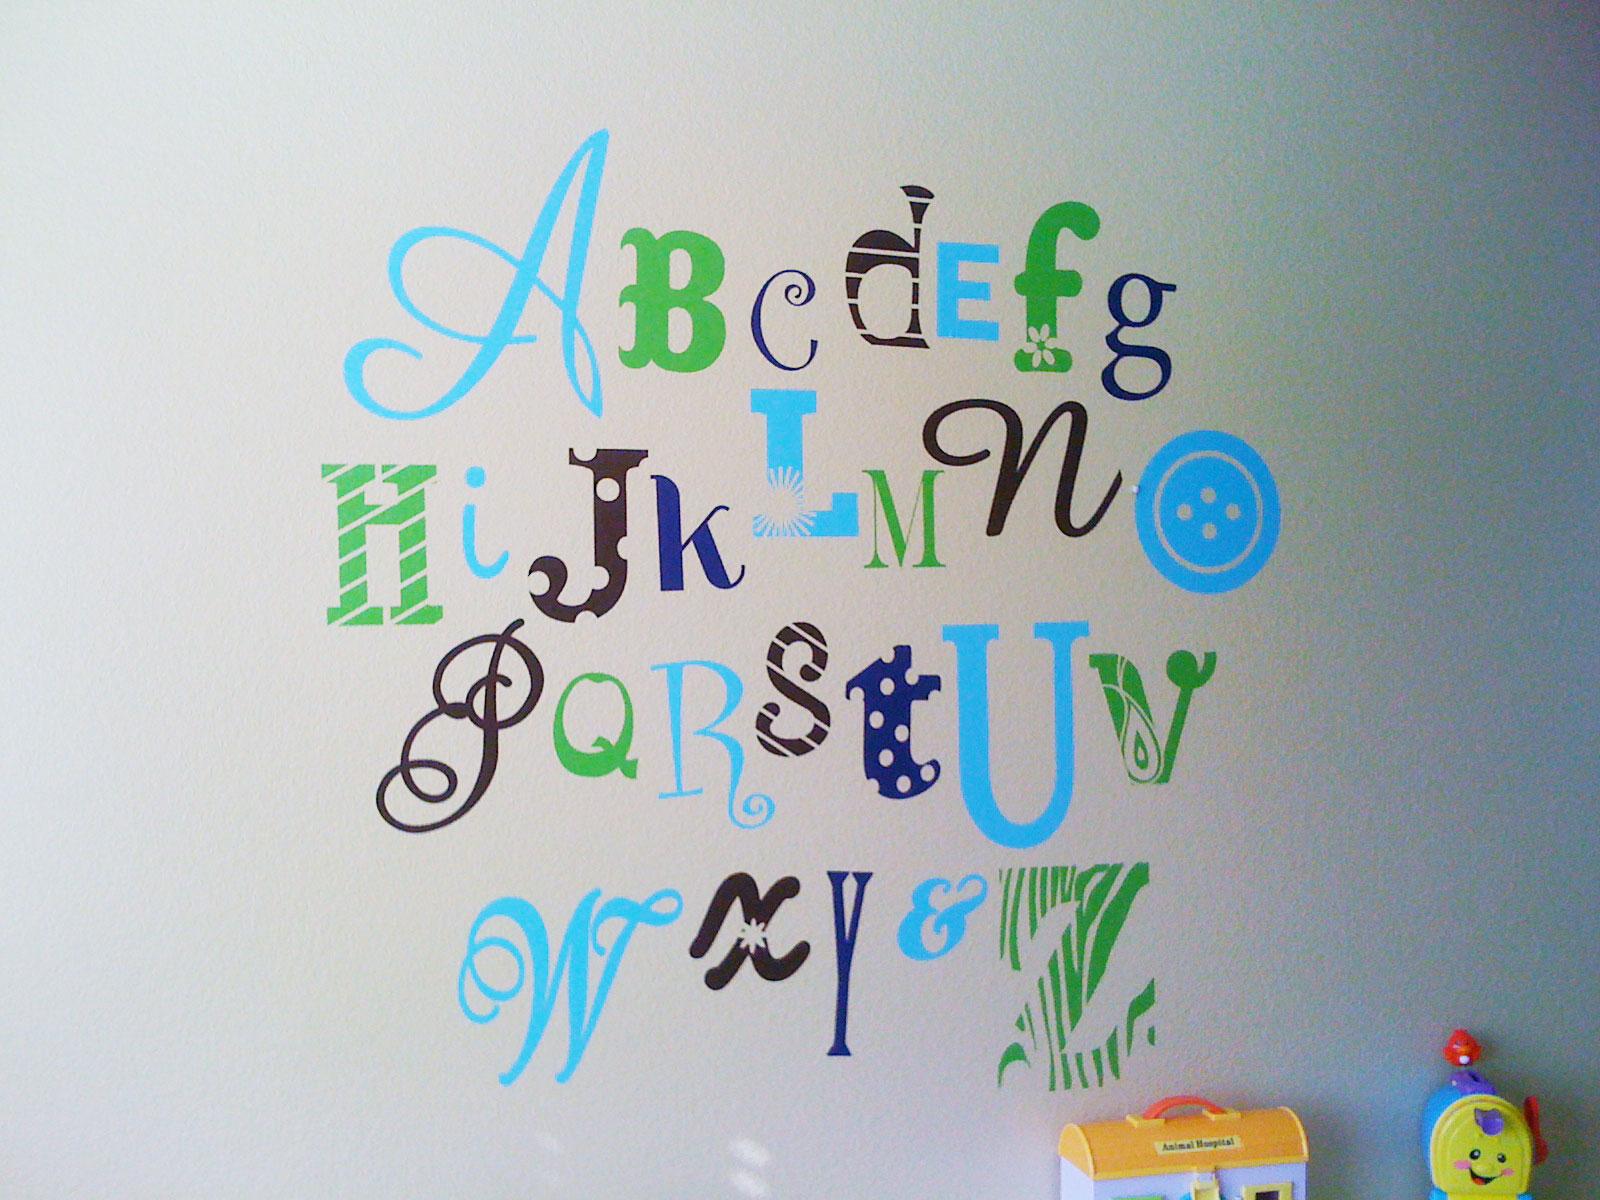 http://1.bp.blogspot.com/_wTxUzwcRh7Y/TKj11HpSw8I/AAAAAAAAC0M/4sHJQapEl4M/s1600/Alphabet.jpg